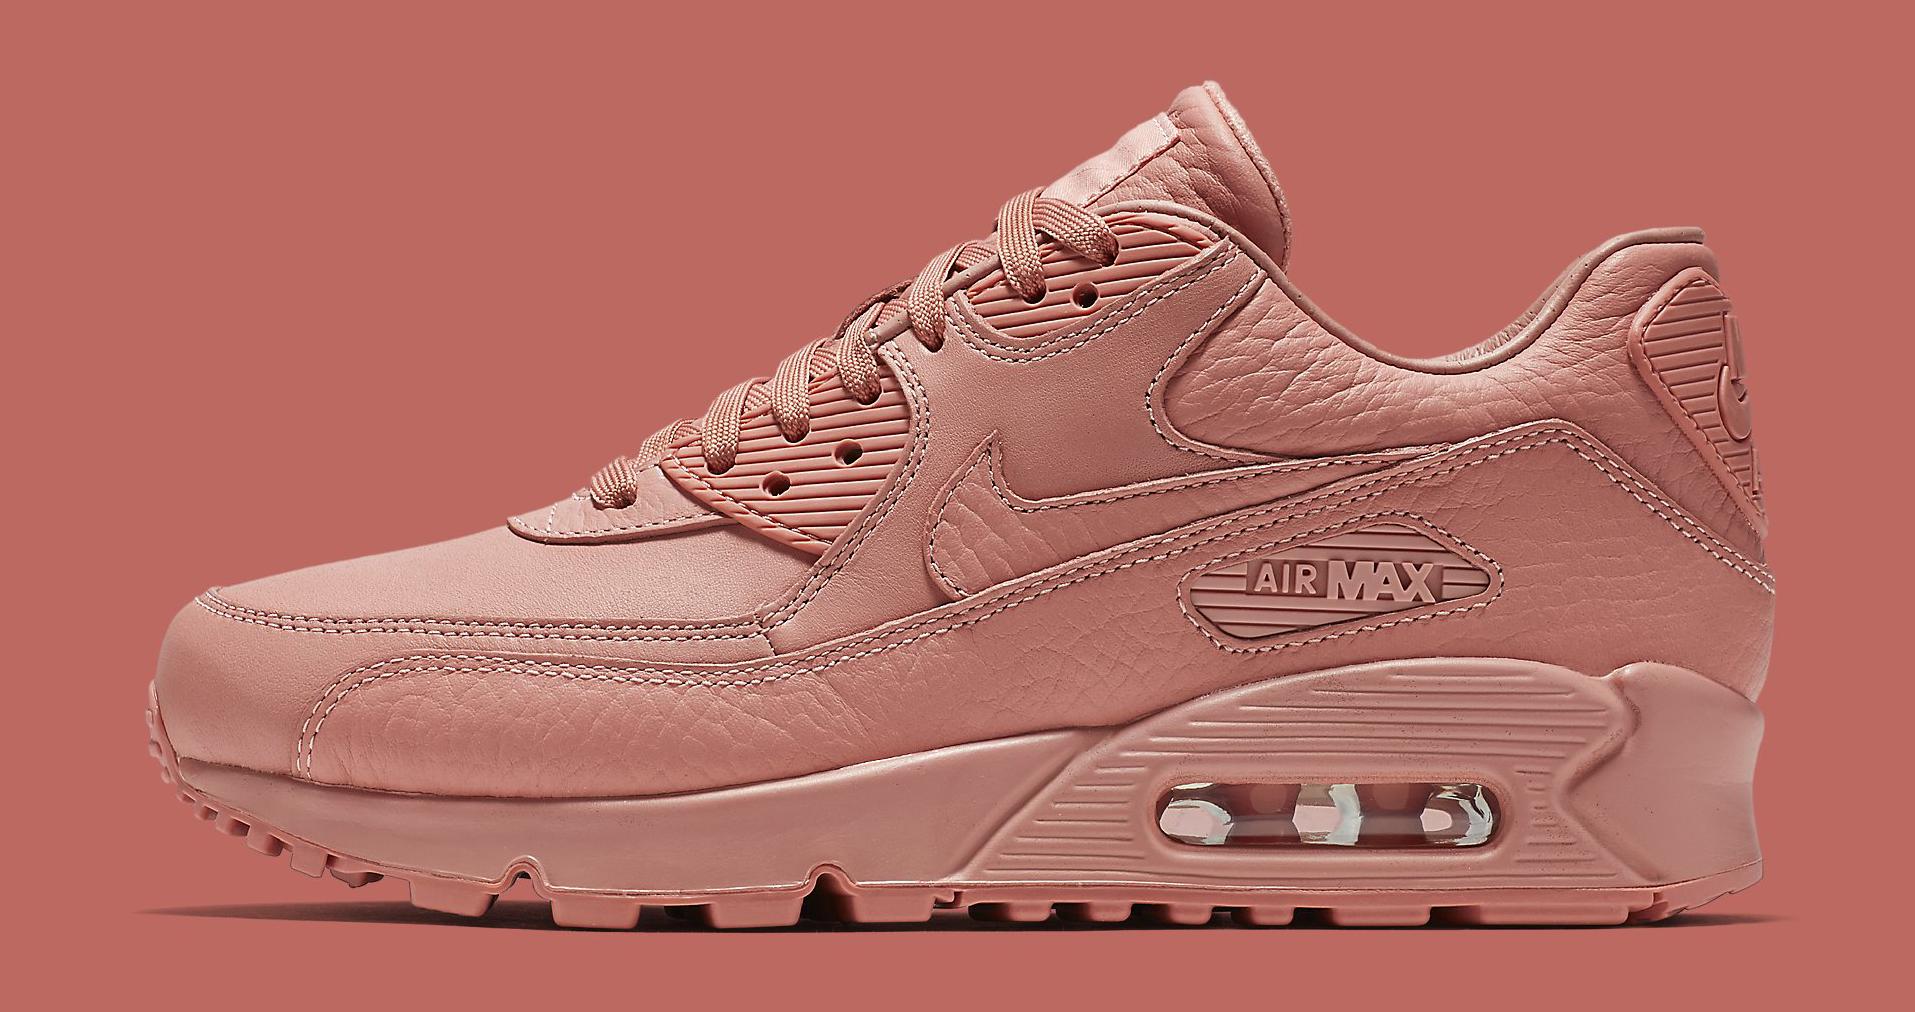 Nike Air Max 90 Pinnacle Pink 839612 601 | Sole Collector